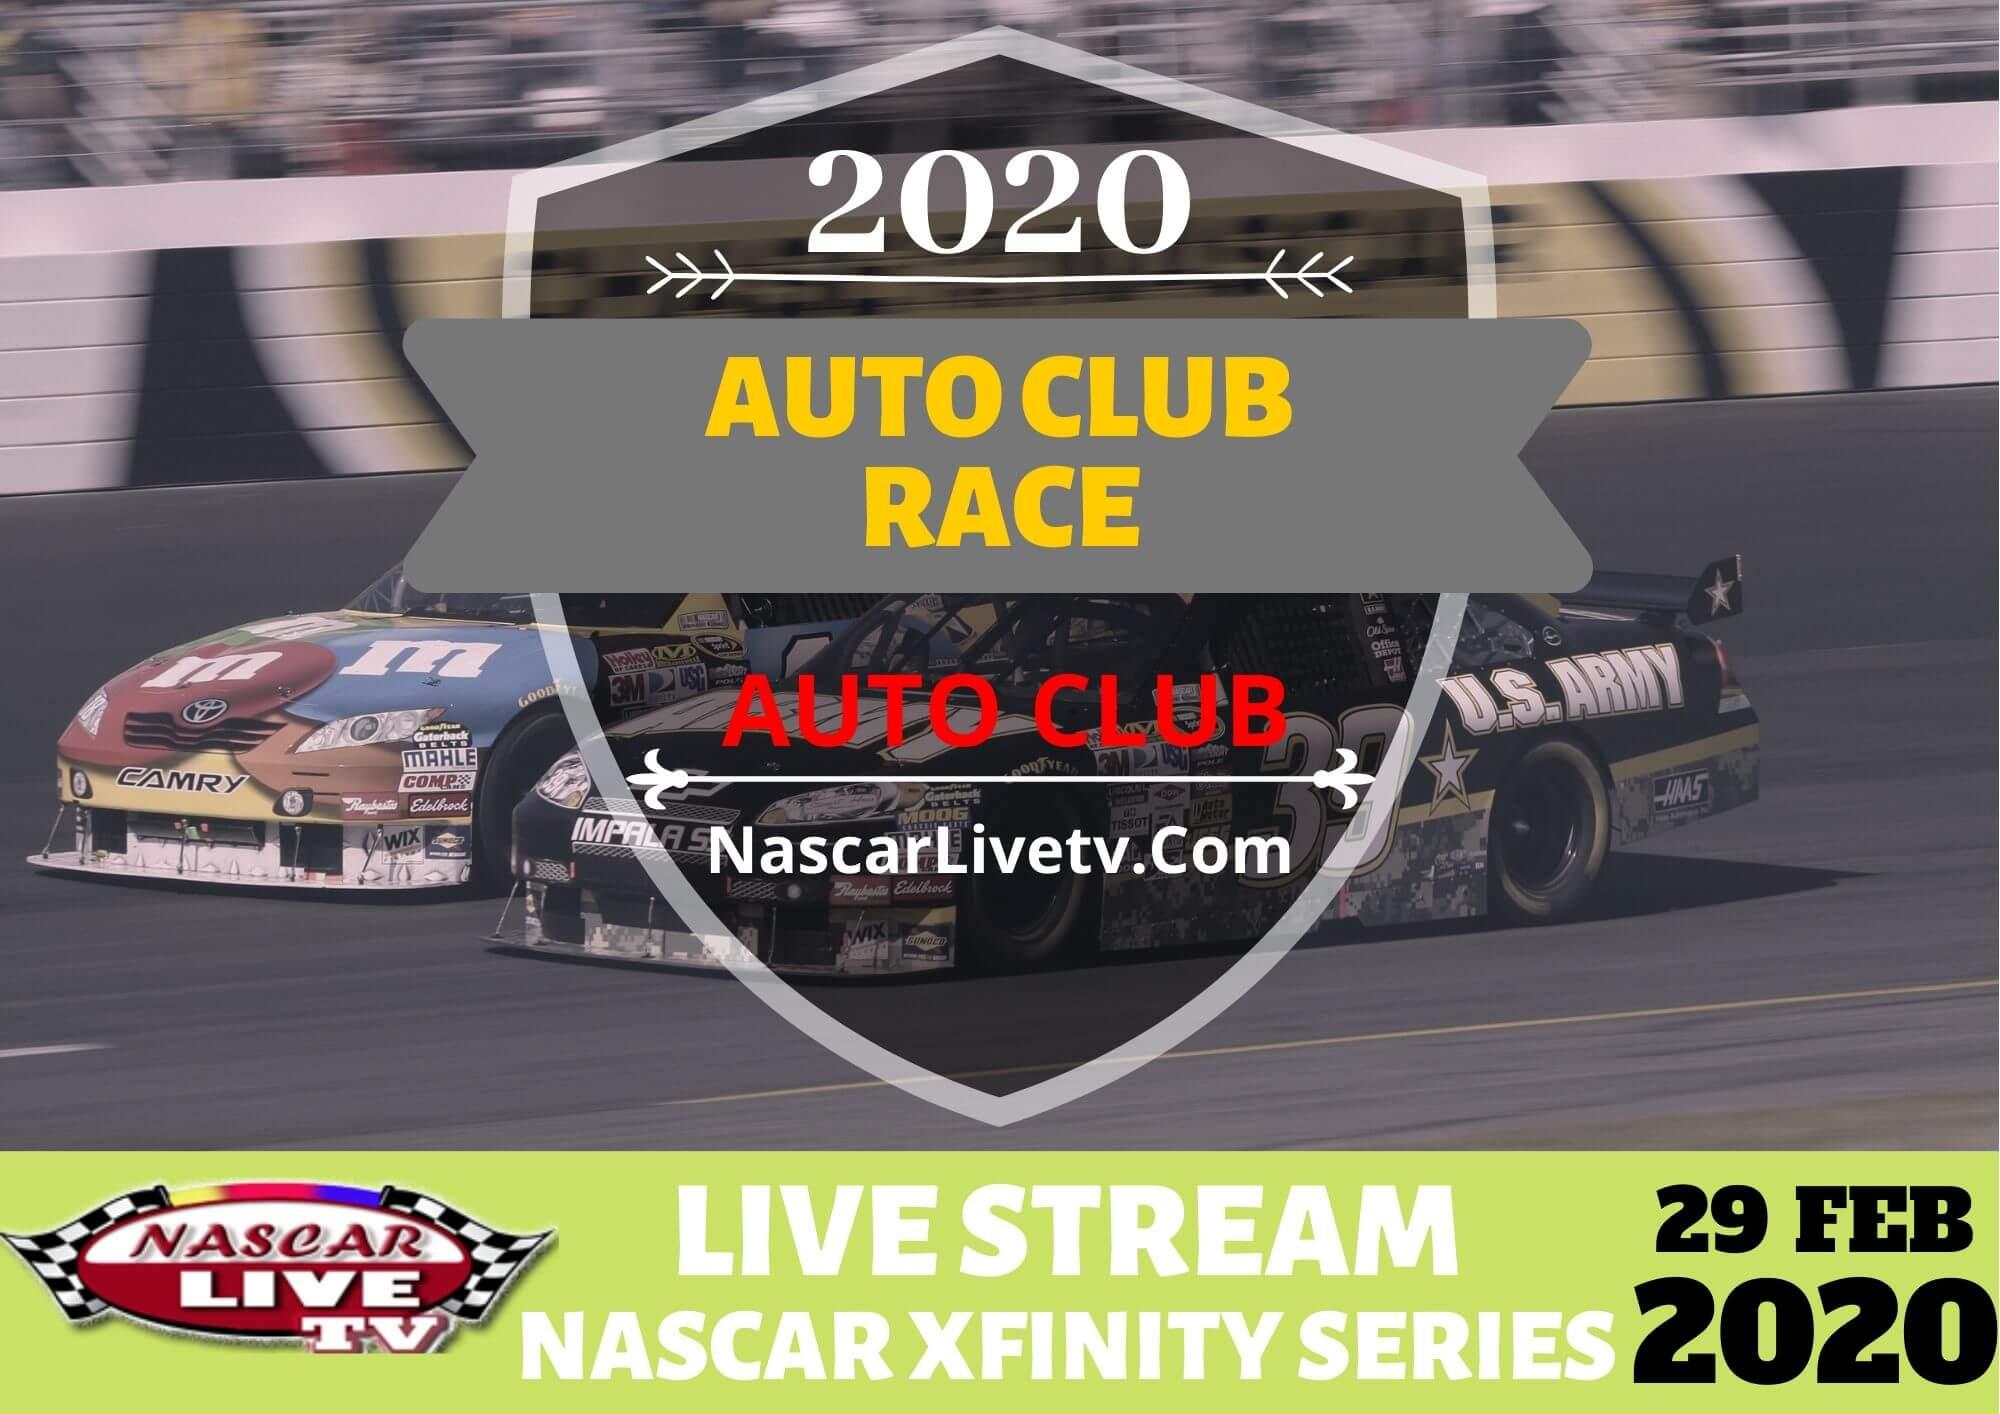 NXS Race At Auto Club Live Stream 2020